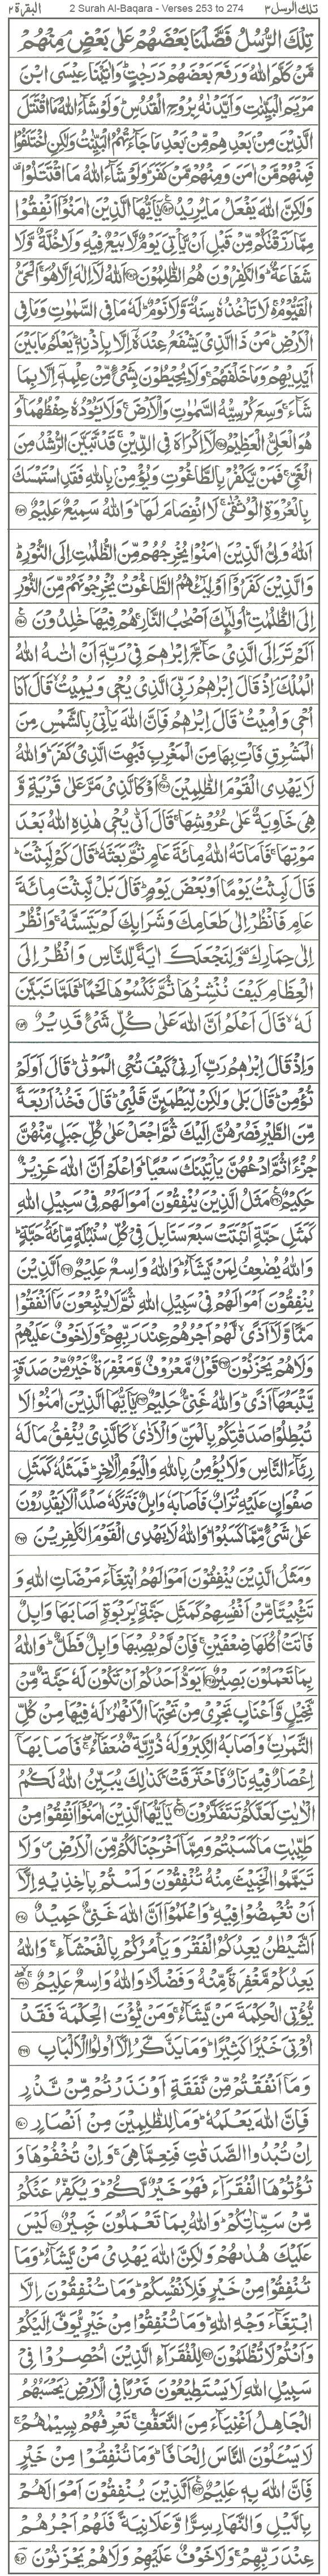 2 Surah Al-Baqara - Verses 253 to 274